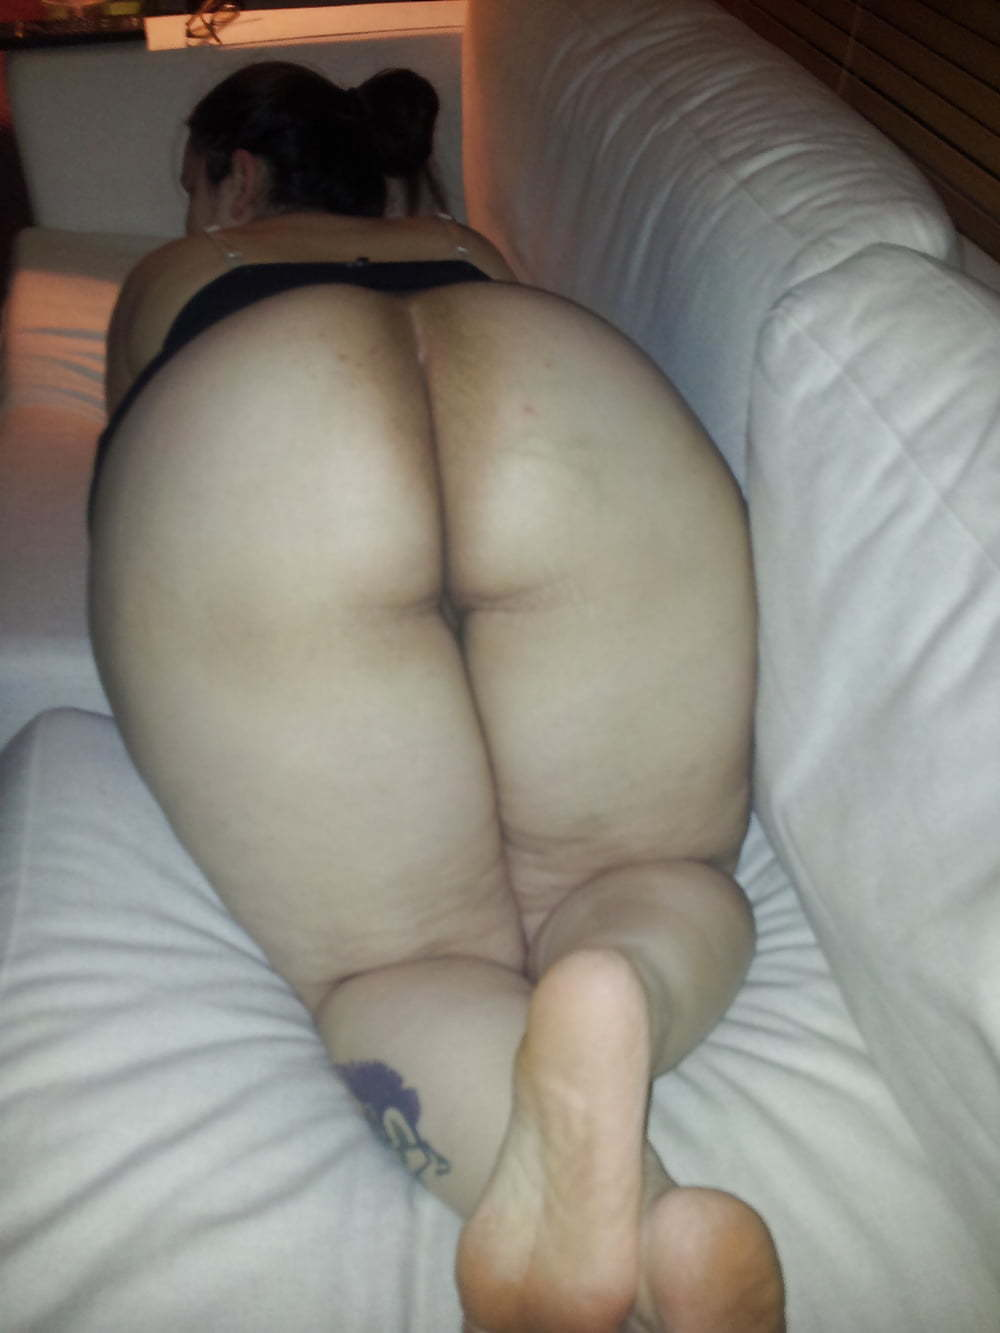 gordas amateur porno